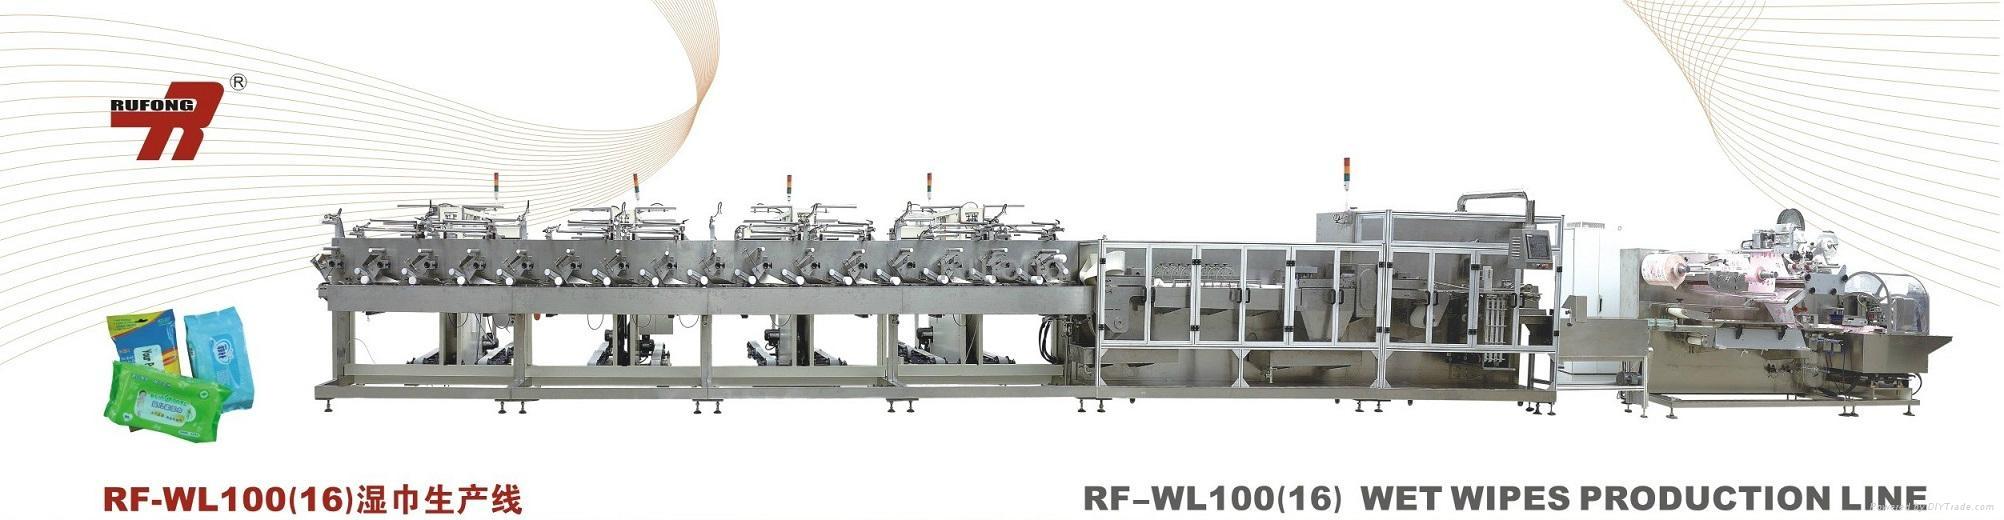 RF-WL100(16) Wet Wipes Production Line 2